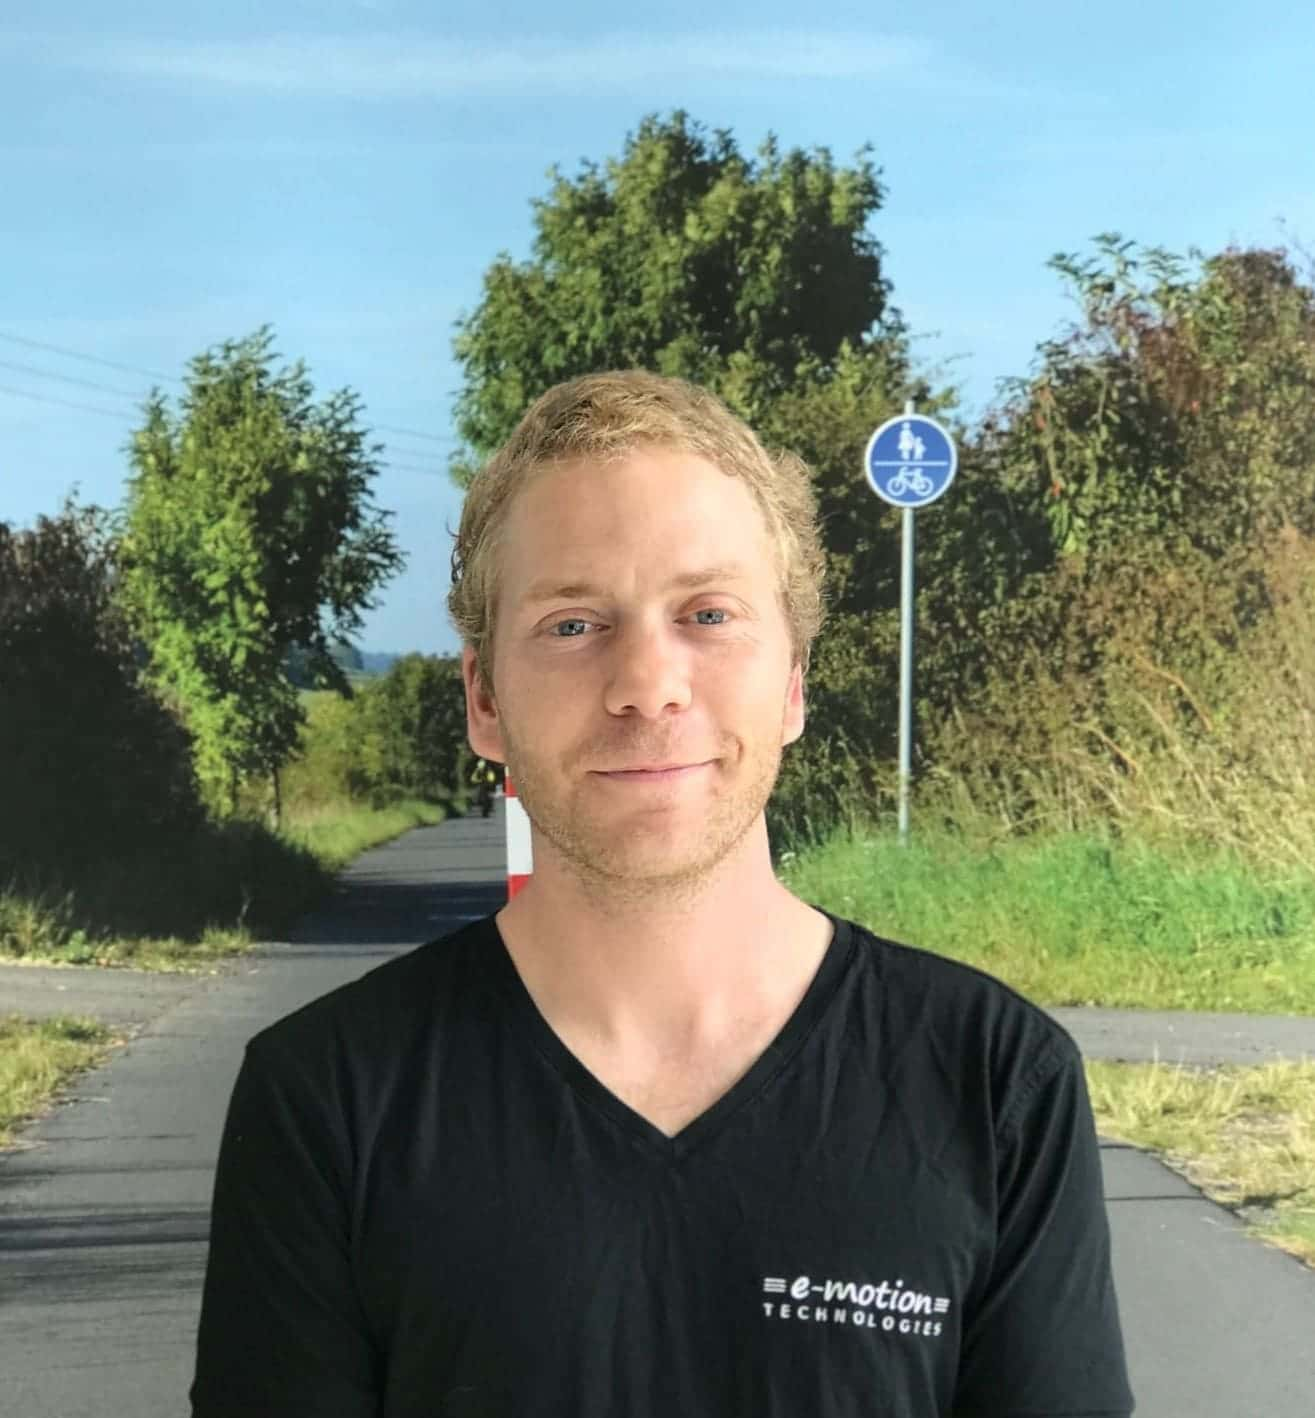 Team_Arrau-Ost_Christian Sempach Portrait vor Schild